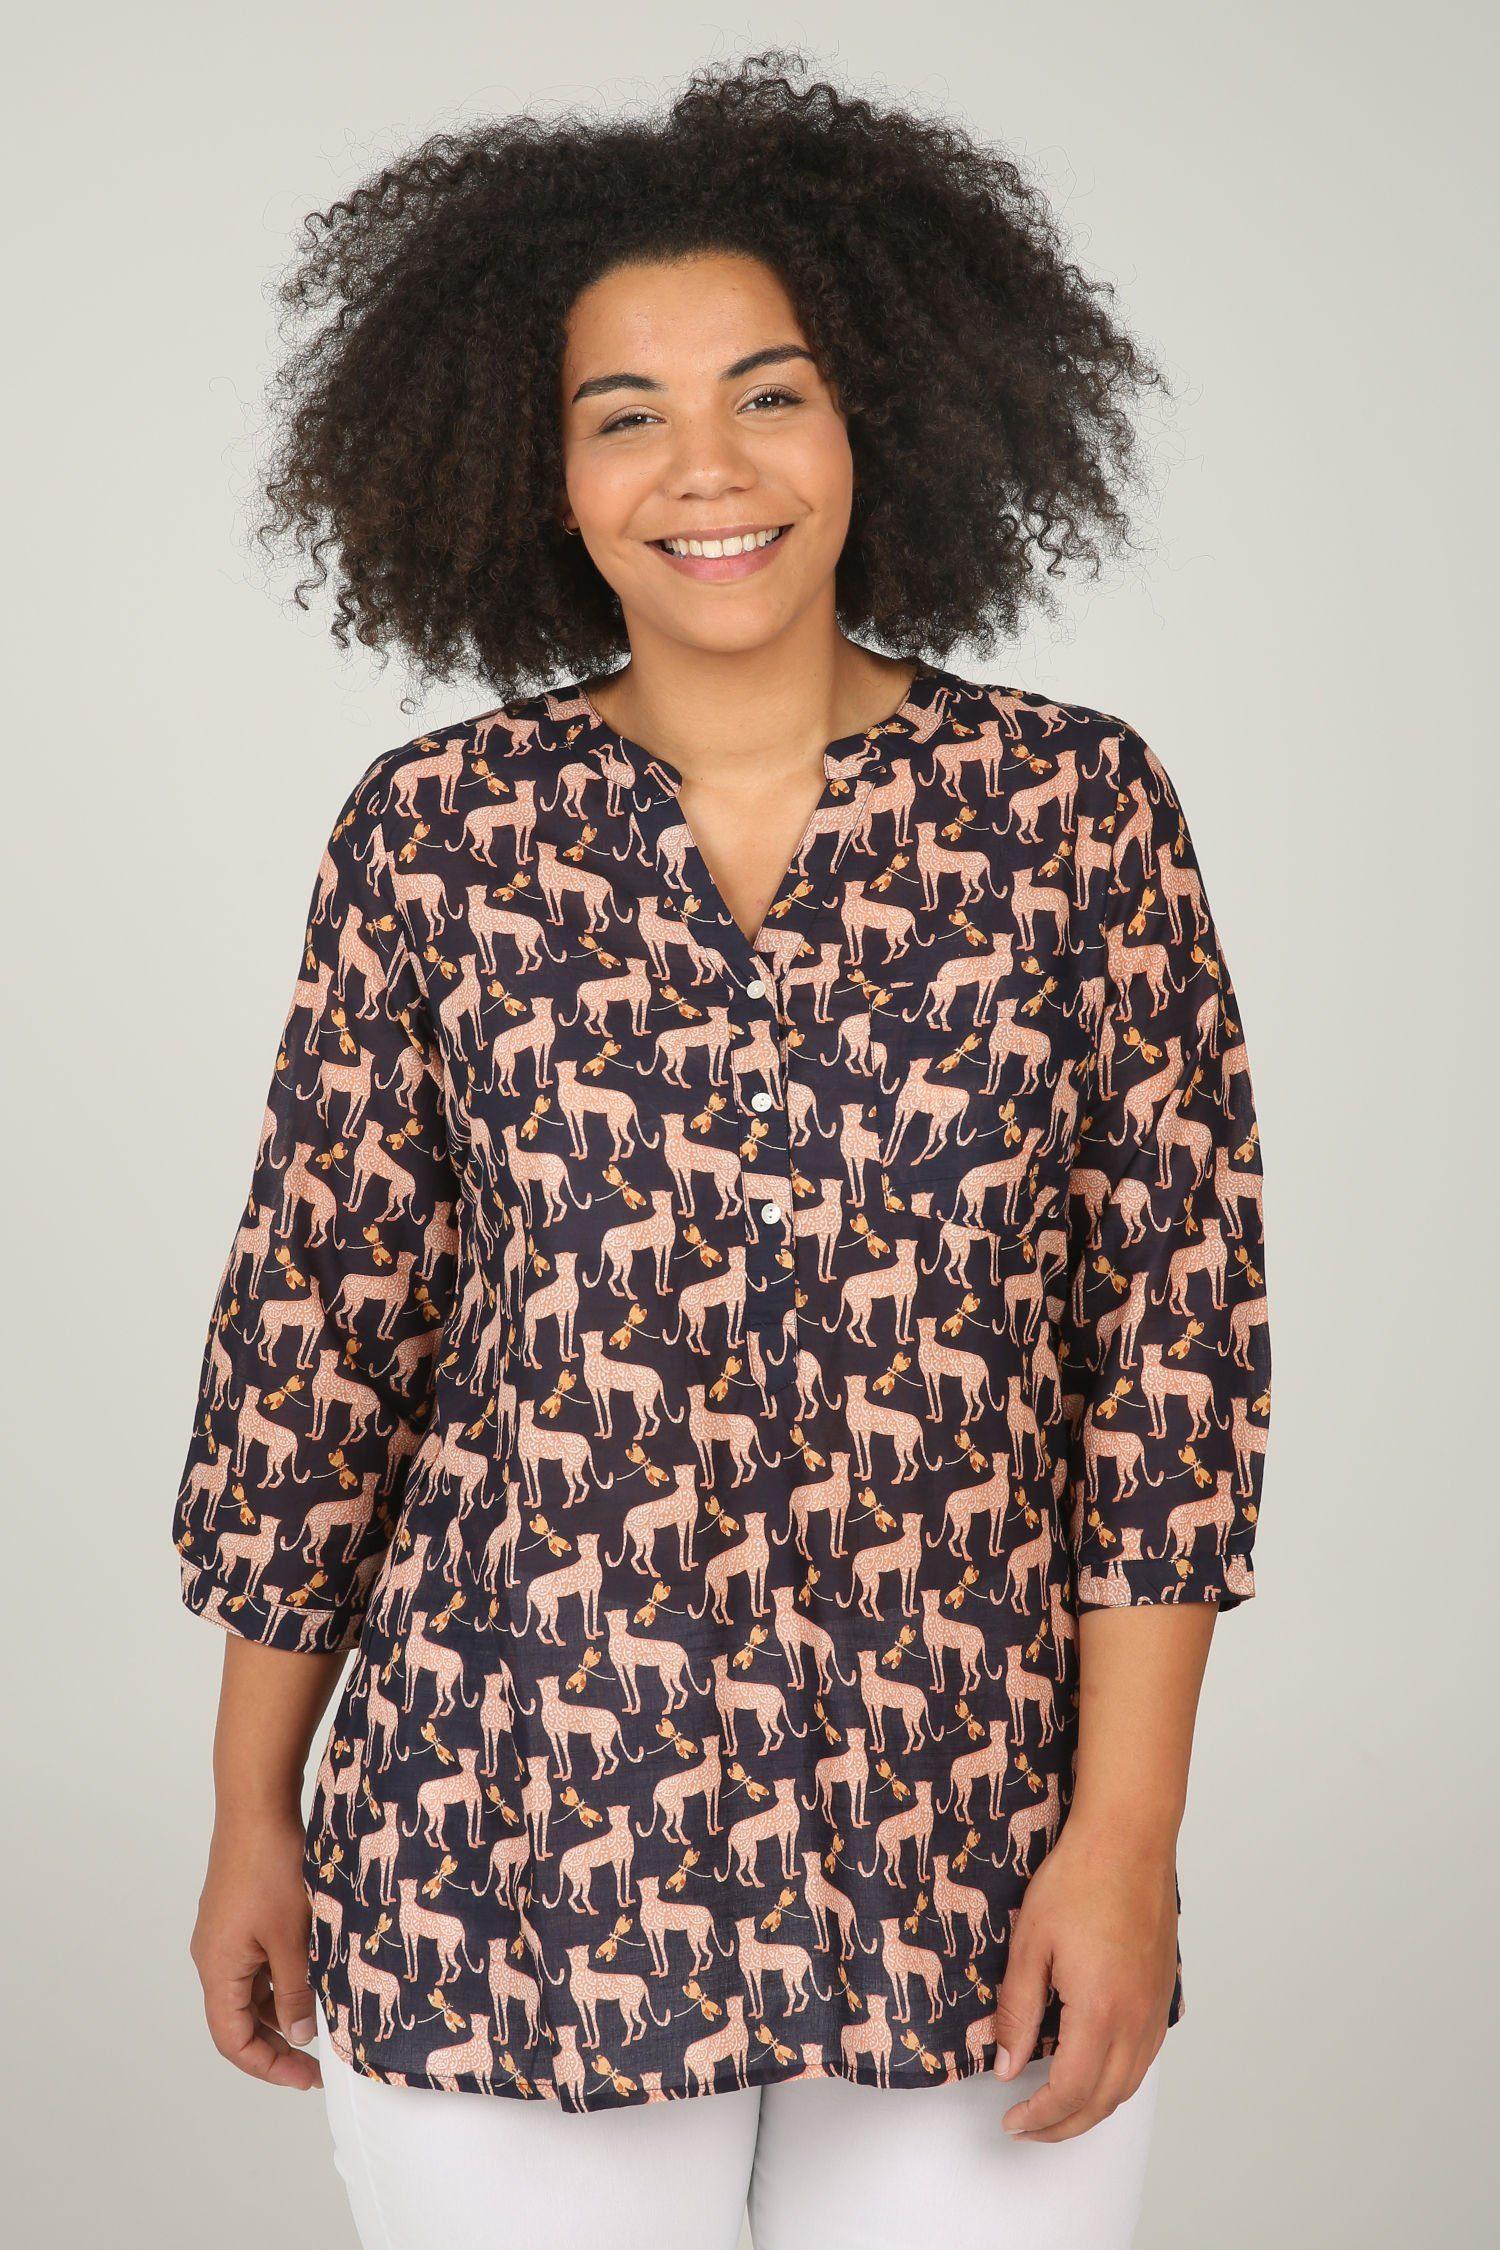 Paprika Druckbluse Bluse mit Tier-Print